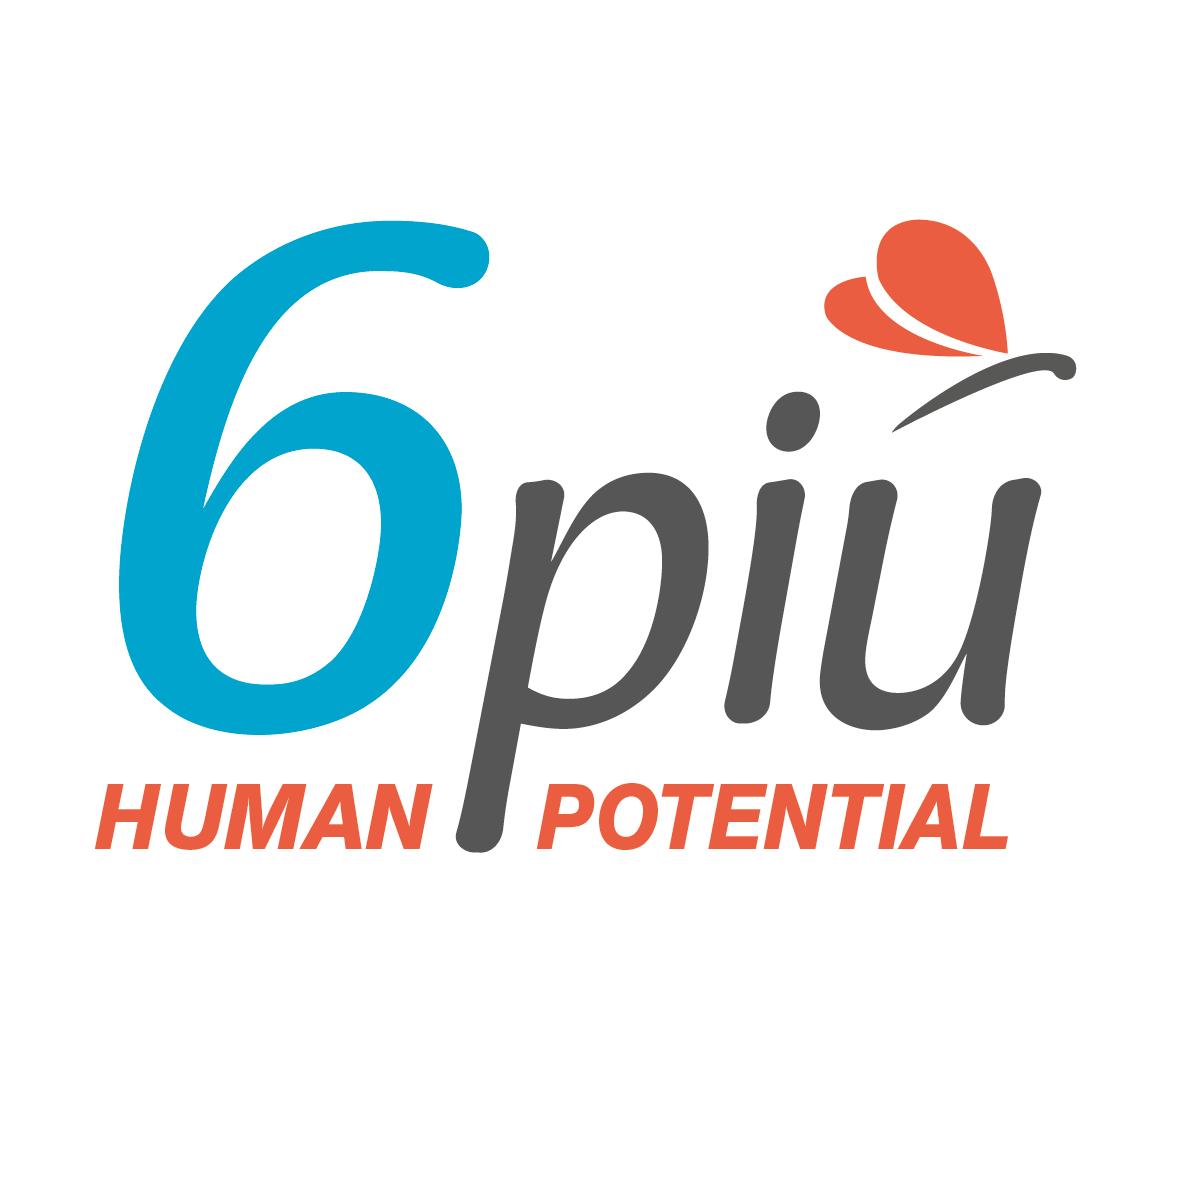 6piu' | Human Potential